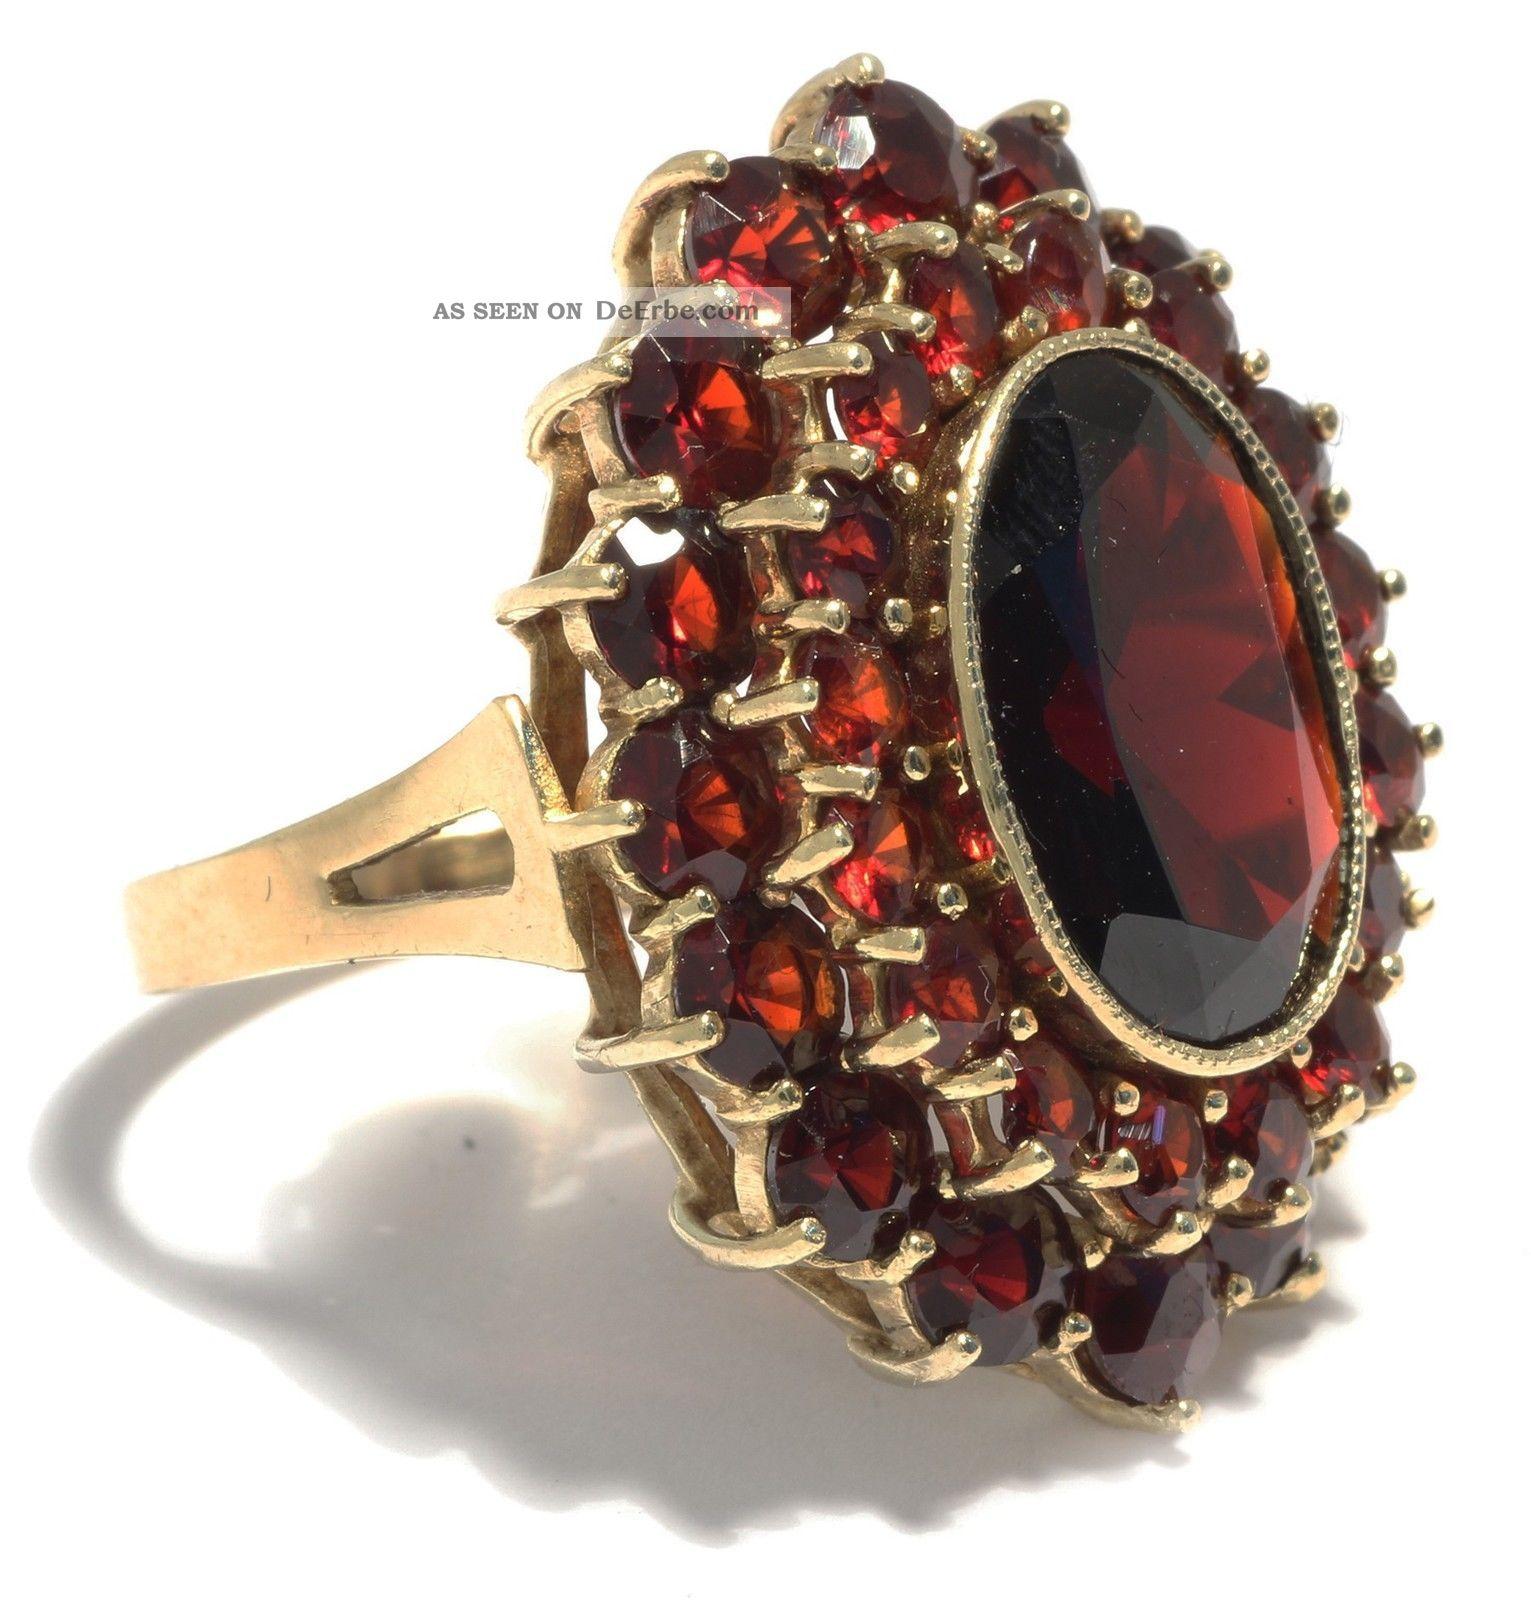 Riesig Antiker Groer Granat Ring Gold Antique Garnet